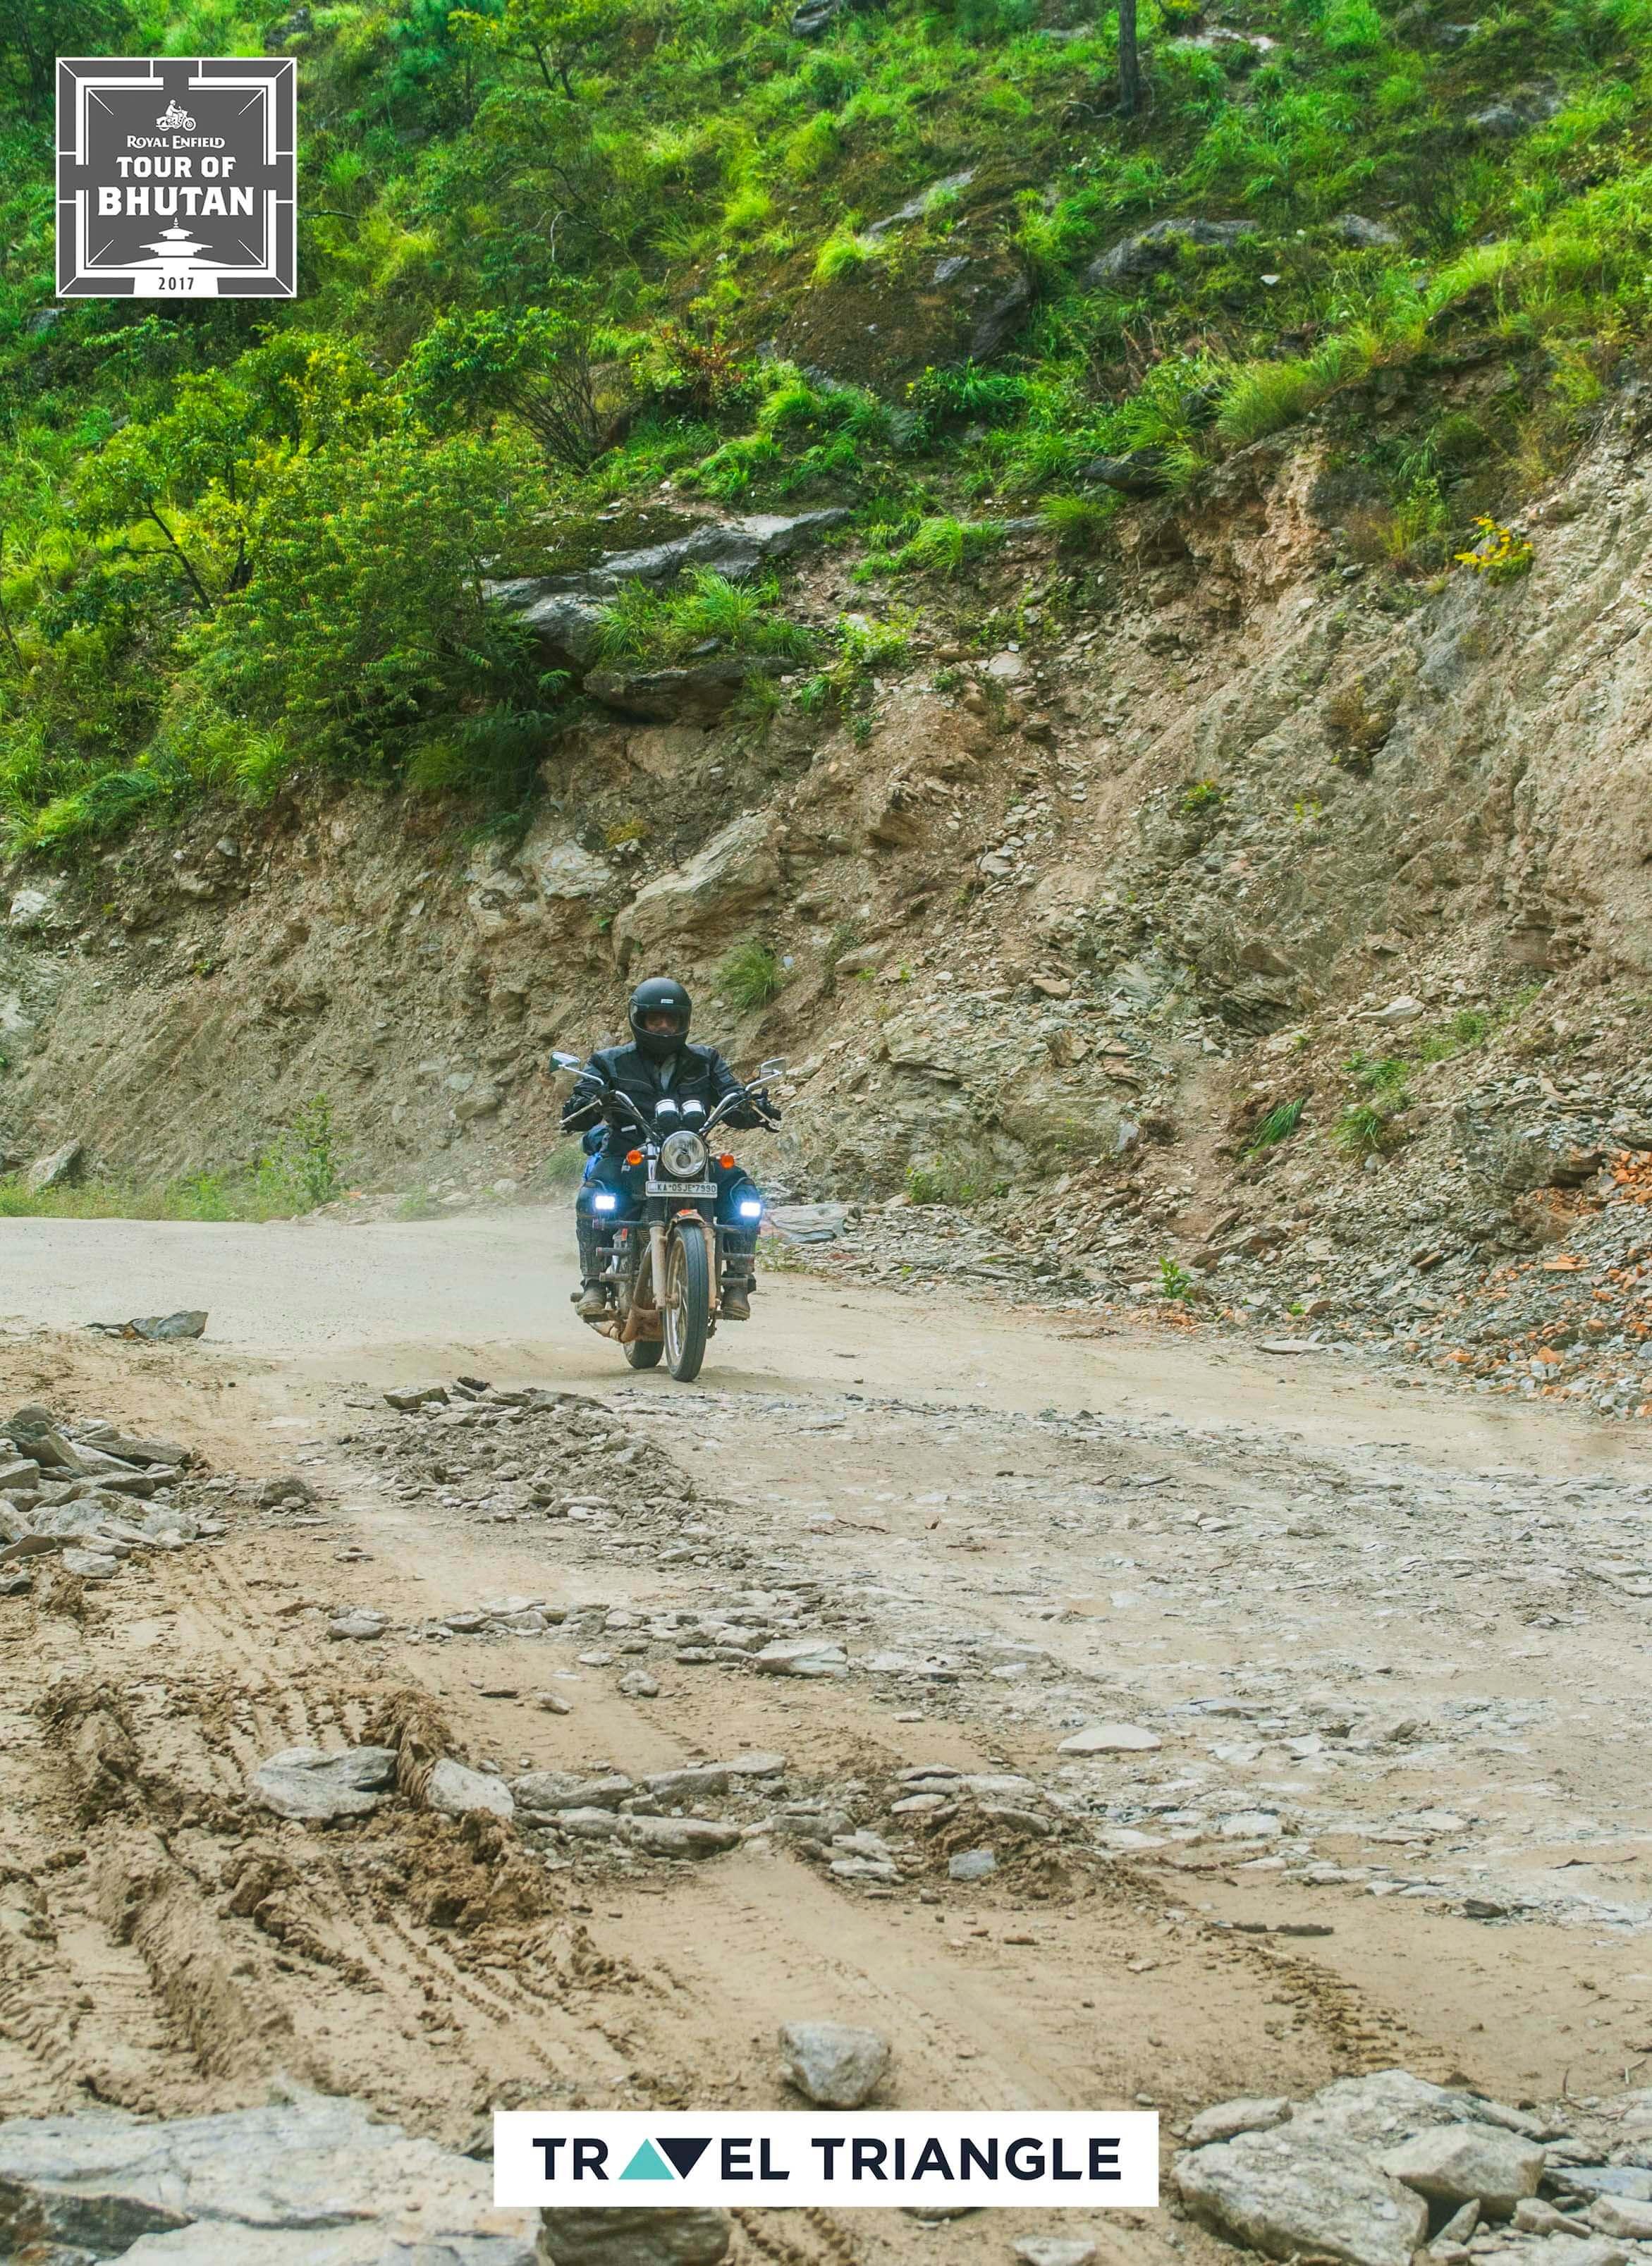 Mongar to Trashigang: riding through curvy roads